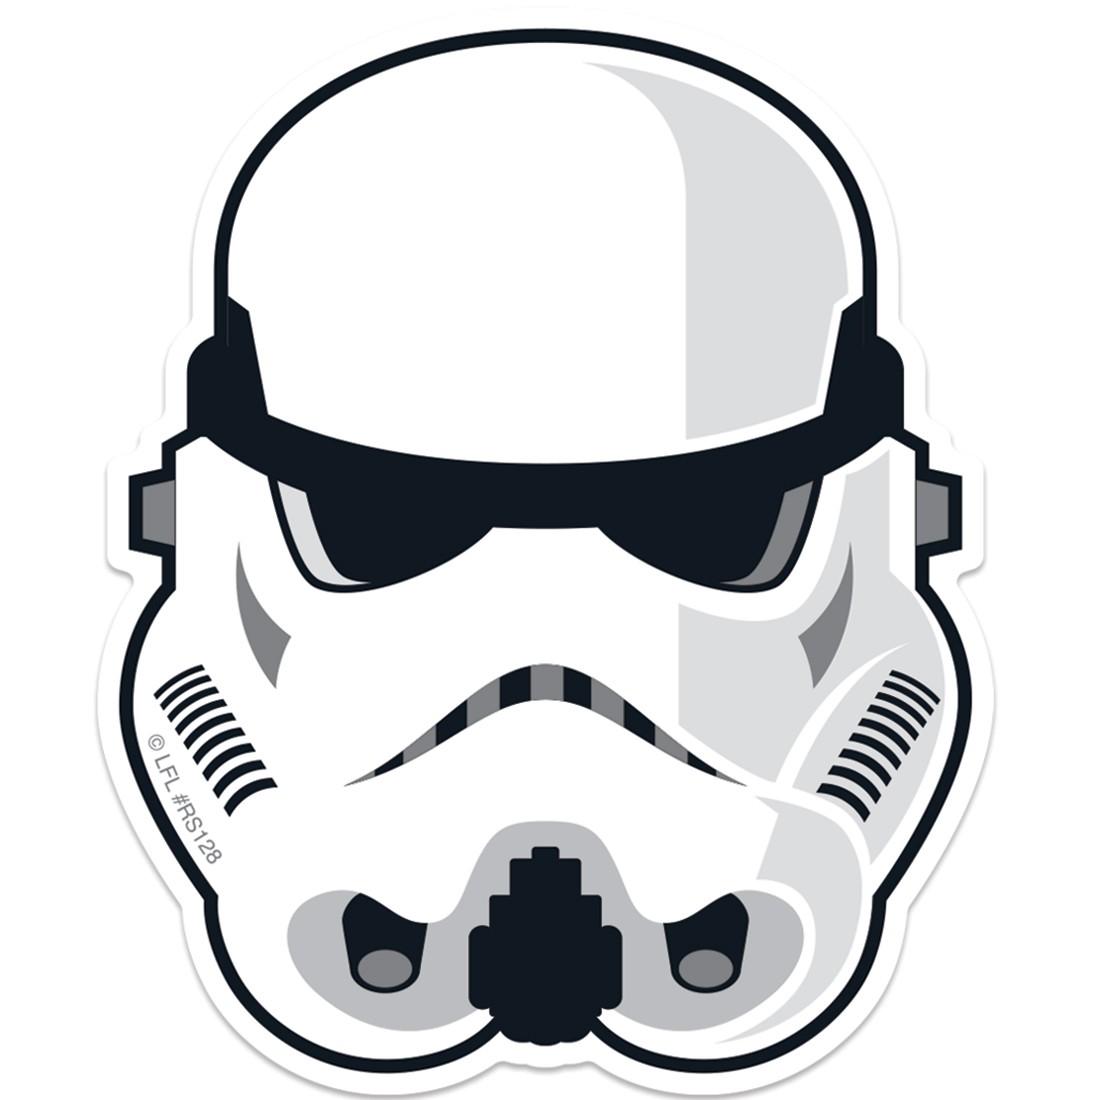 Star Wars Re-Stickables [image]